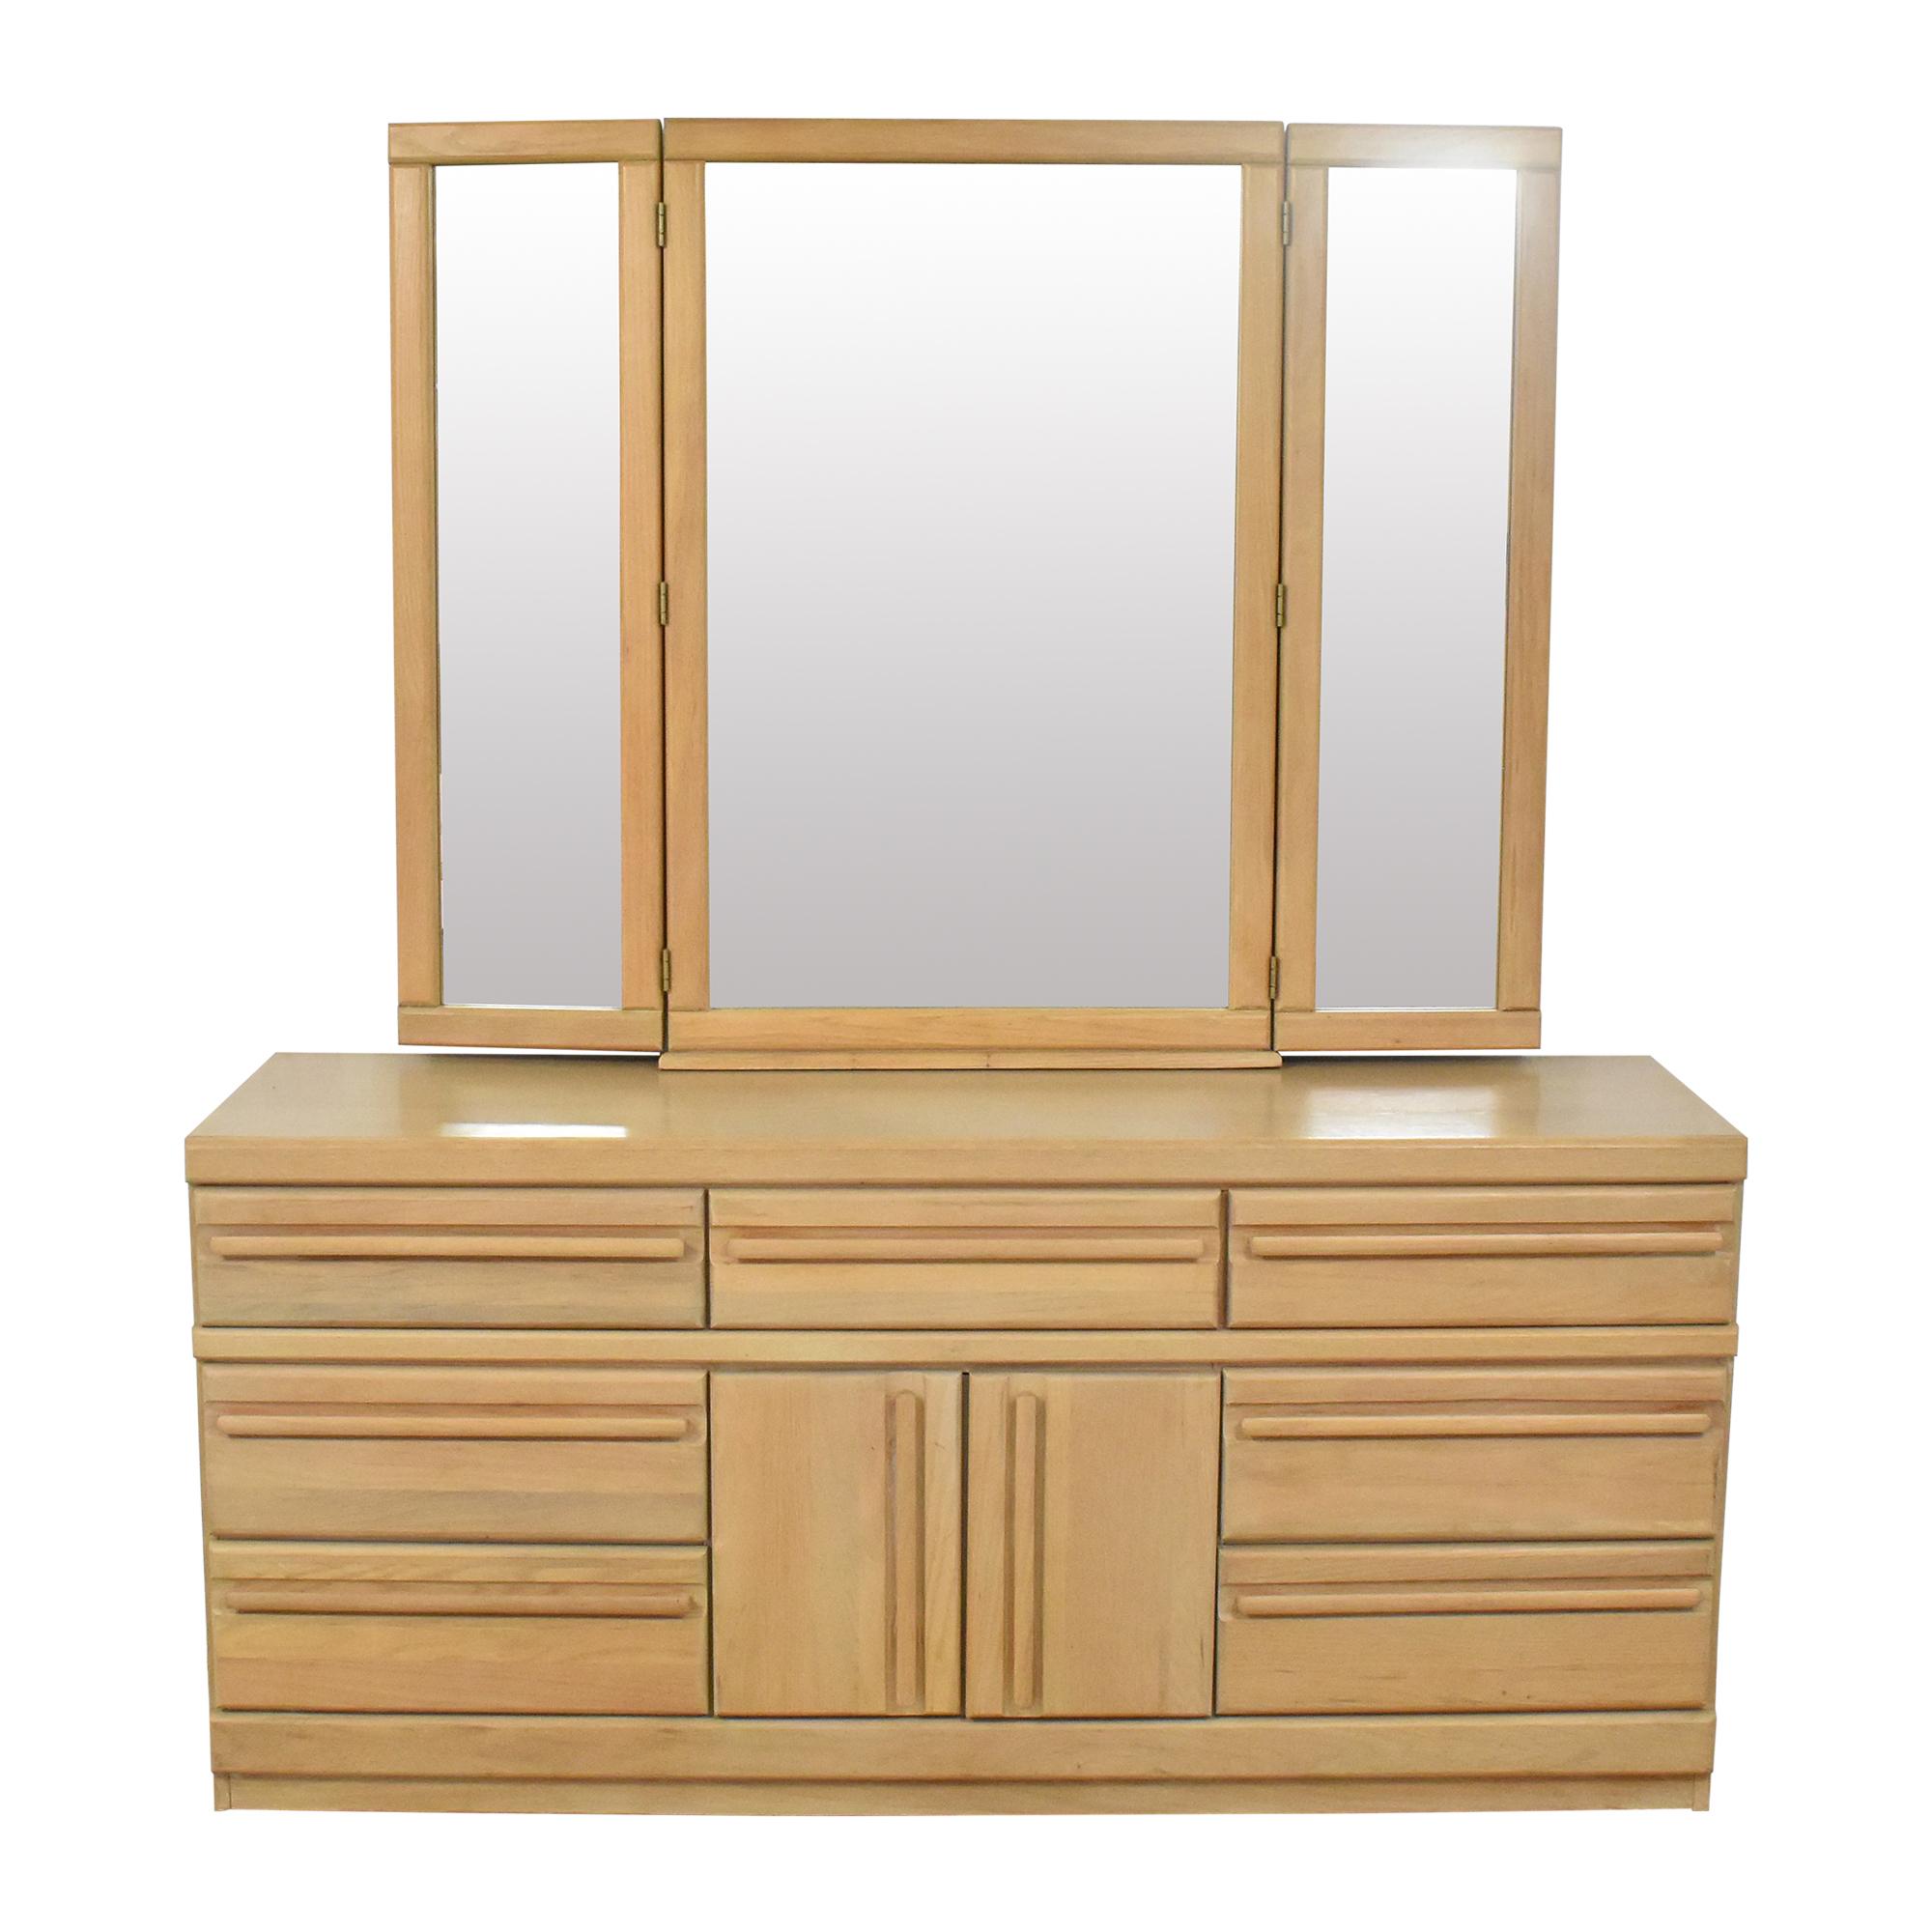 Broyhill Furniture Broyhill Triple Dresser with Mirror price